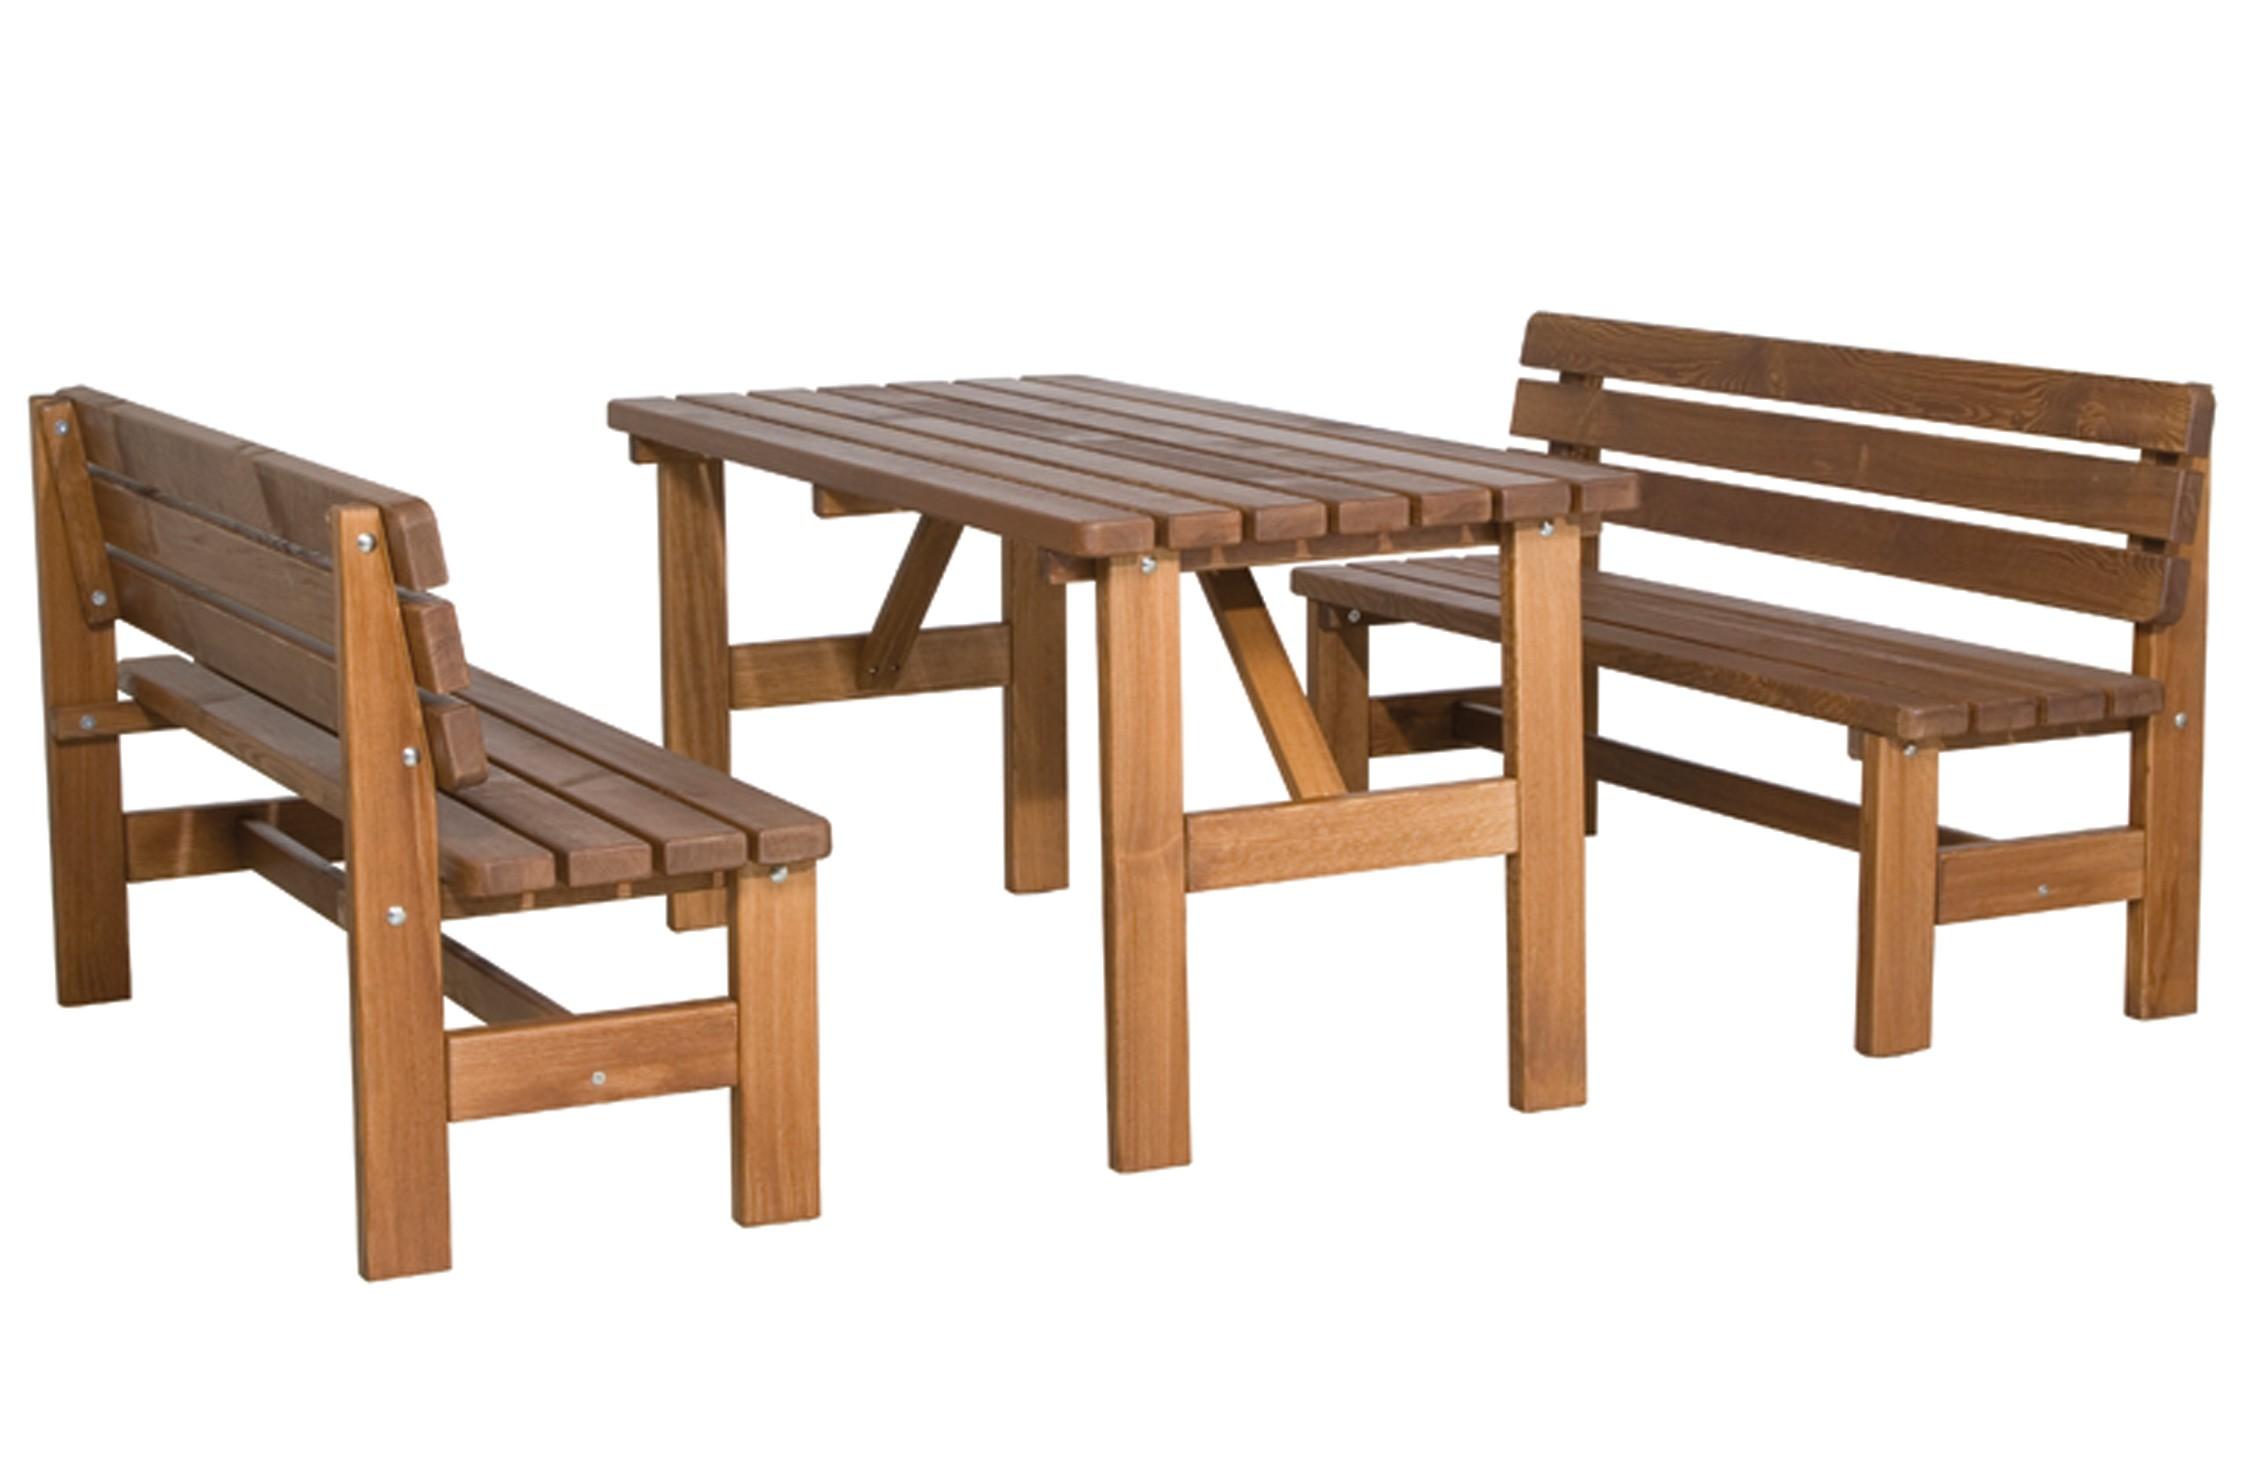 gartenbank tessin 150 cm massivholz braun bei. Black Bedroom Furniture Sets. Home Design Ideas